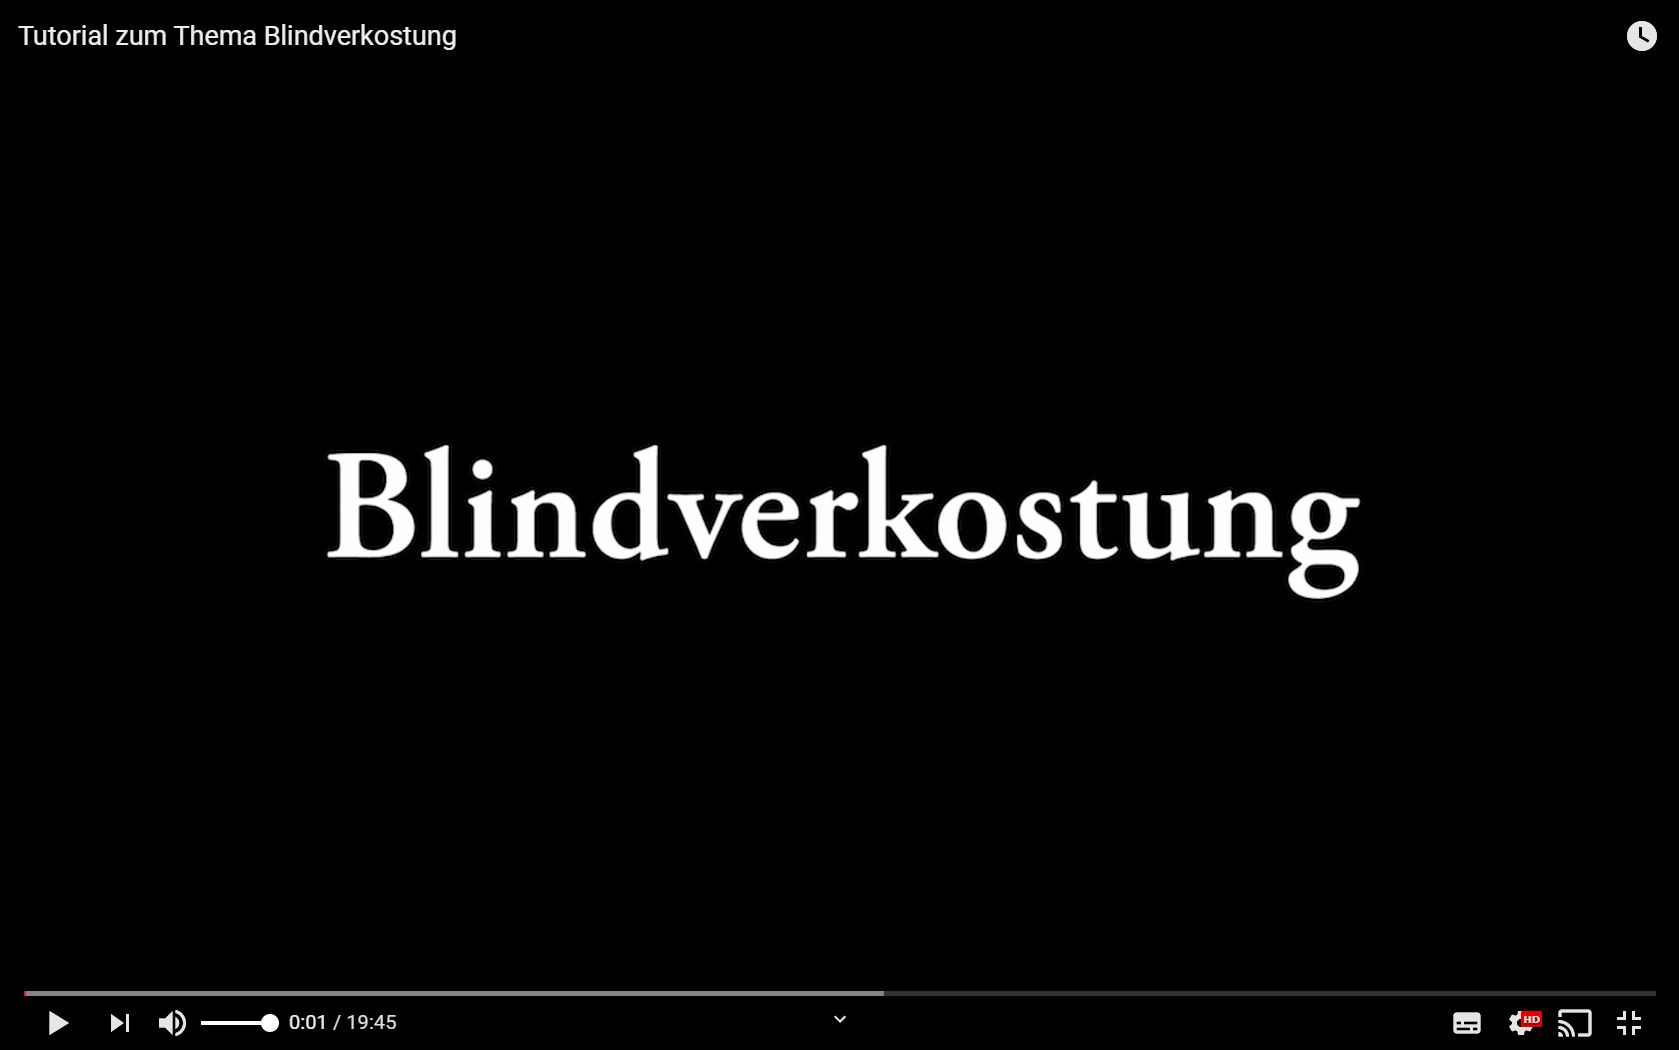 DWI Tutorial zum Thema Blindverkostung - YouTube